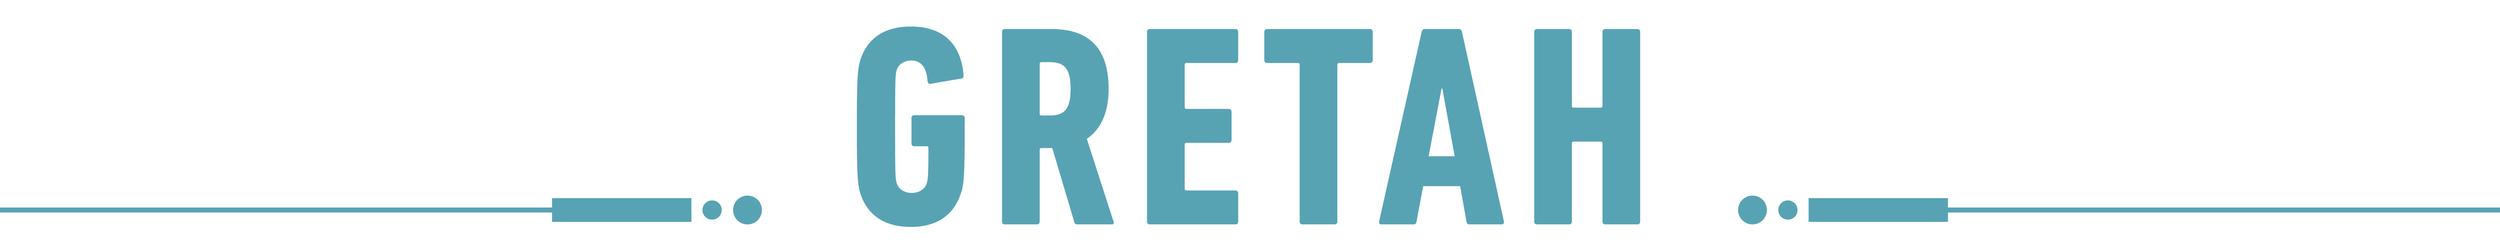 AYTS-WEBSITE-NAMEPLATE10.png